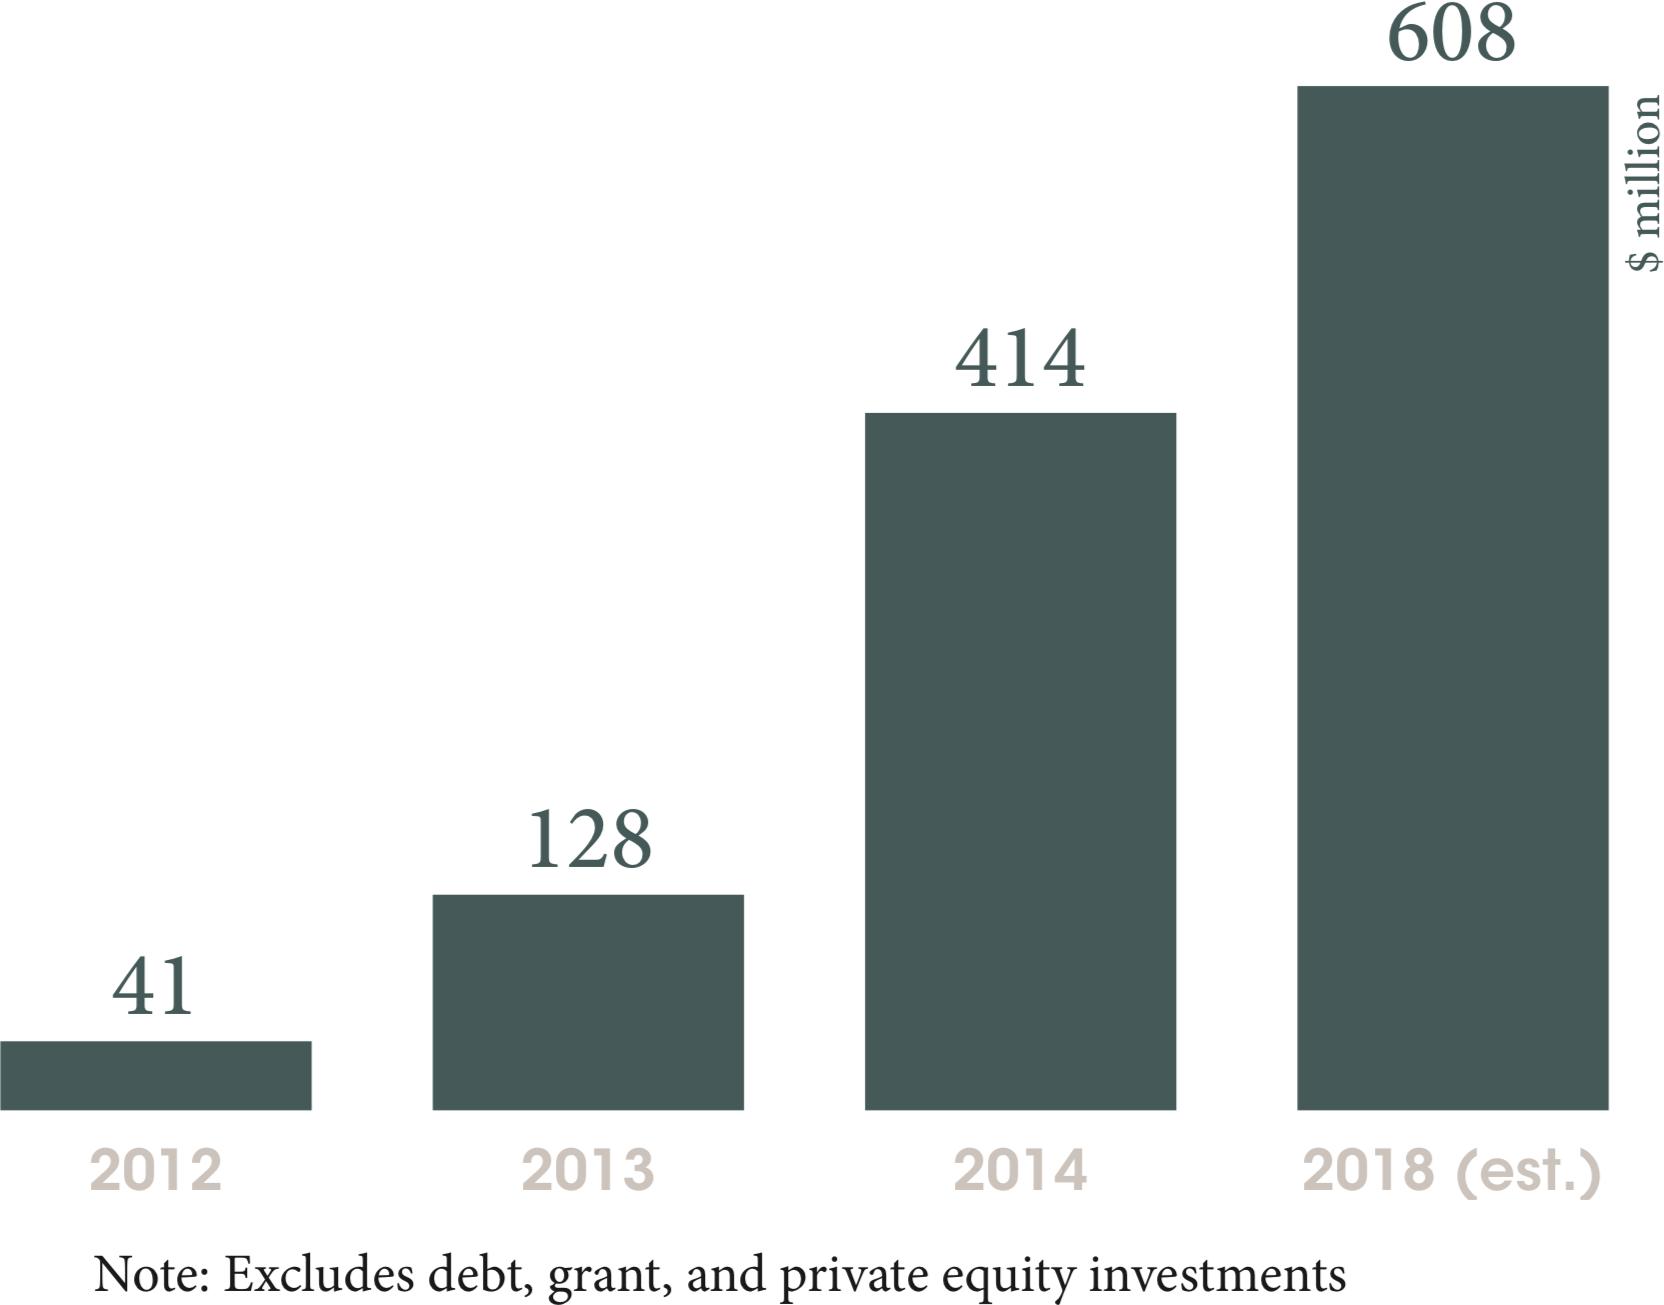 Venture capital funding in African tech start-ups